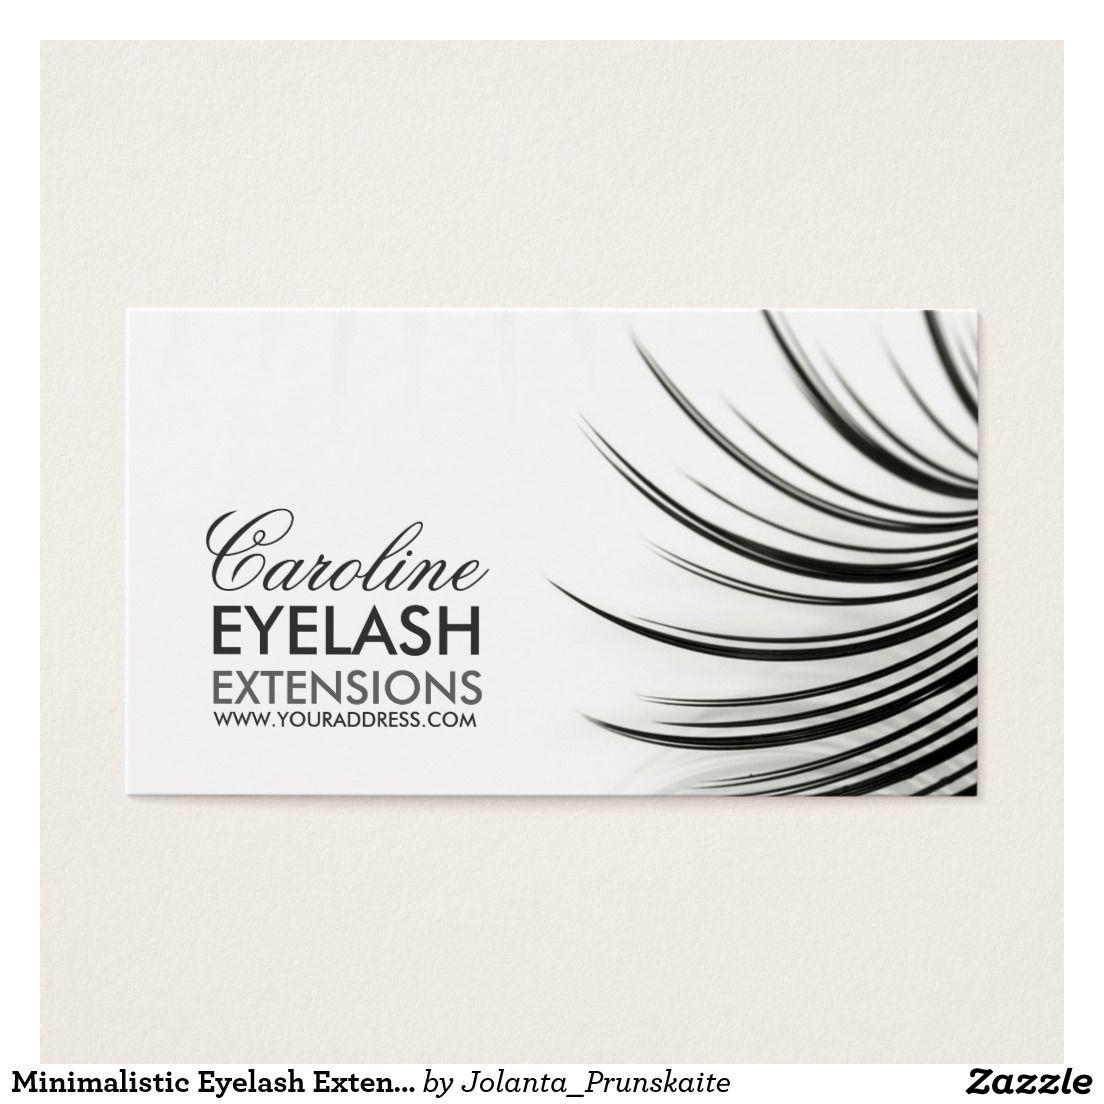 Profile Card In 2018 Eyelash Extensions Pinterest Eyelashes